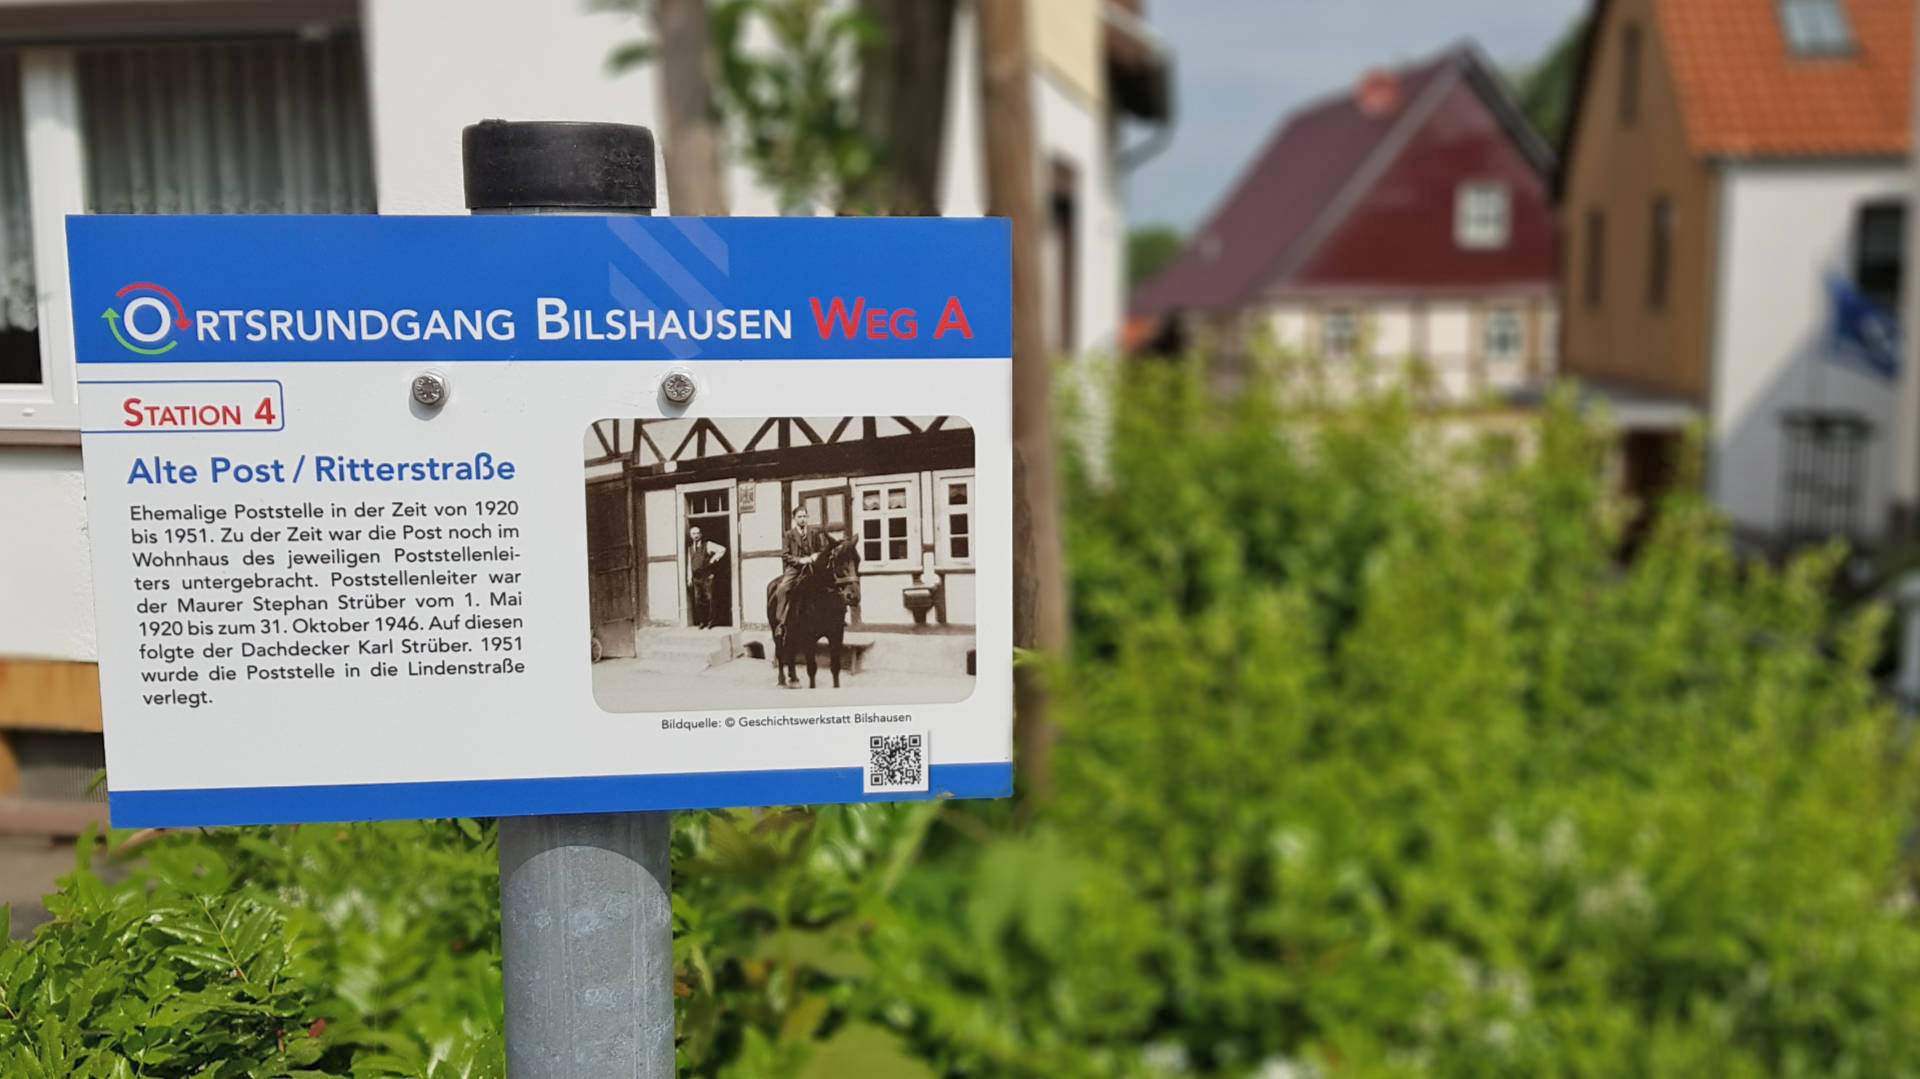 Ortsrundgang Bilshausen - Station 4